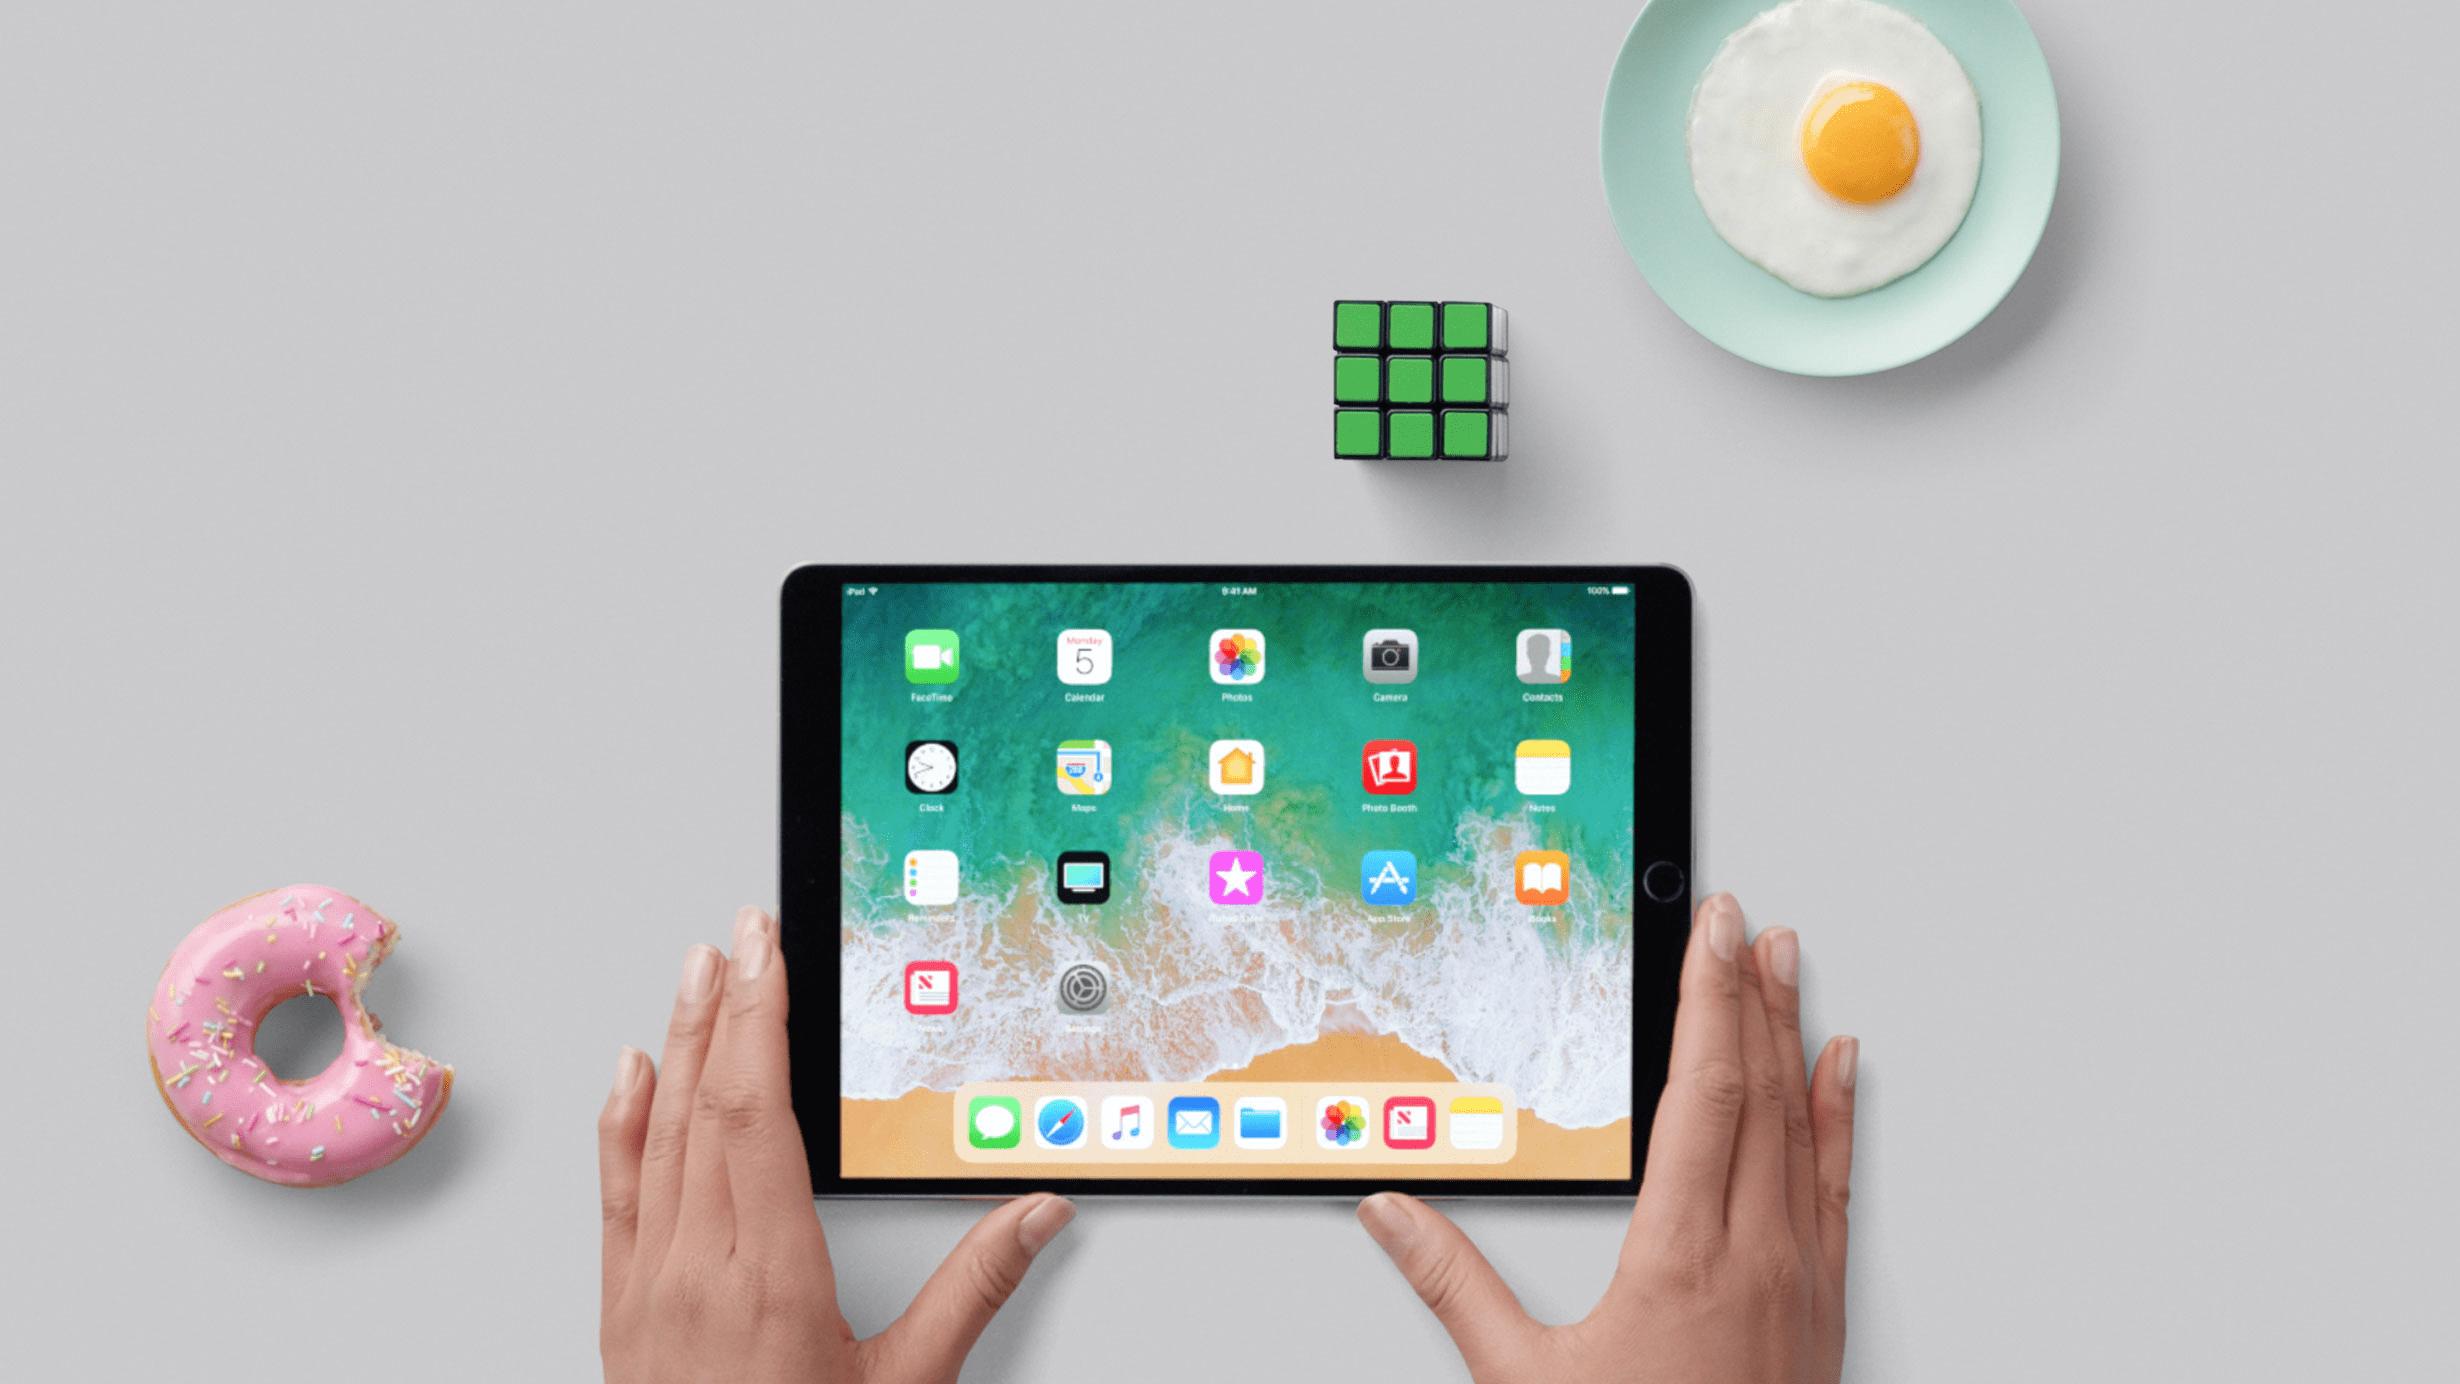 ios 11 ipad lifestyle 16x9